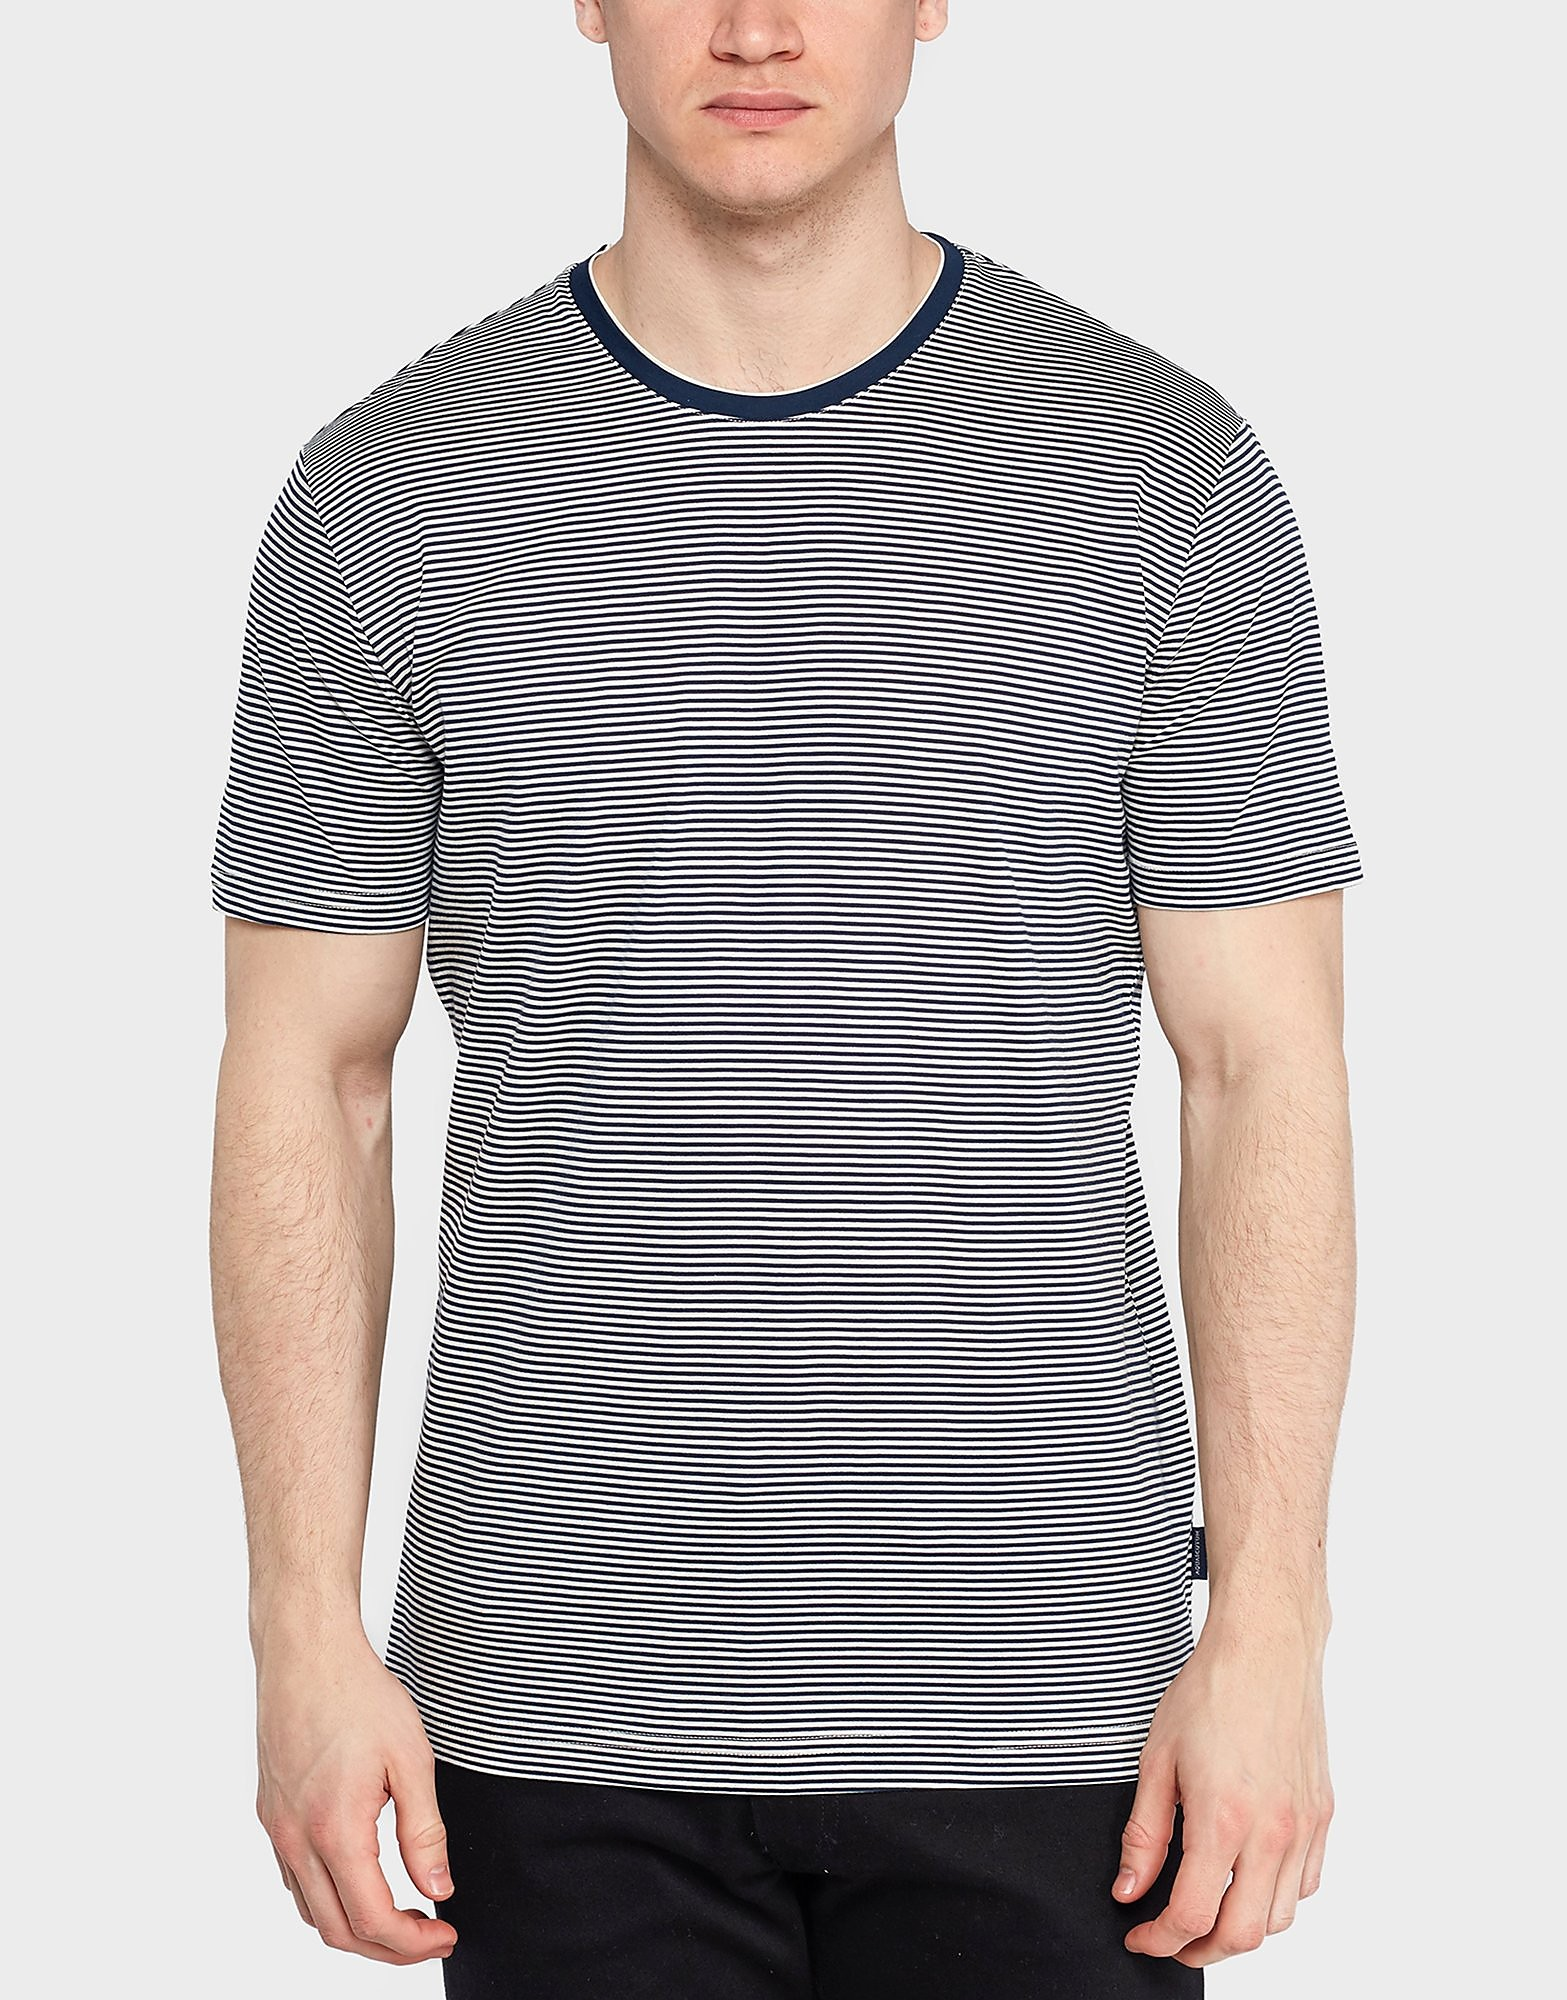 Aquascutum Tyson Stripe Short Sleeve T-Shirt